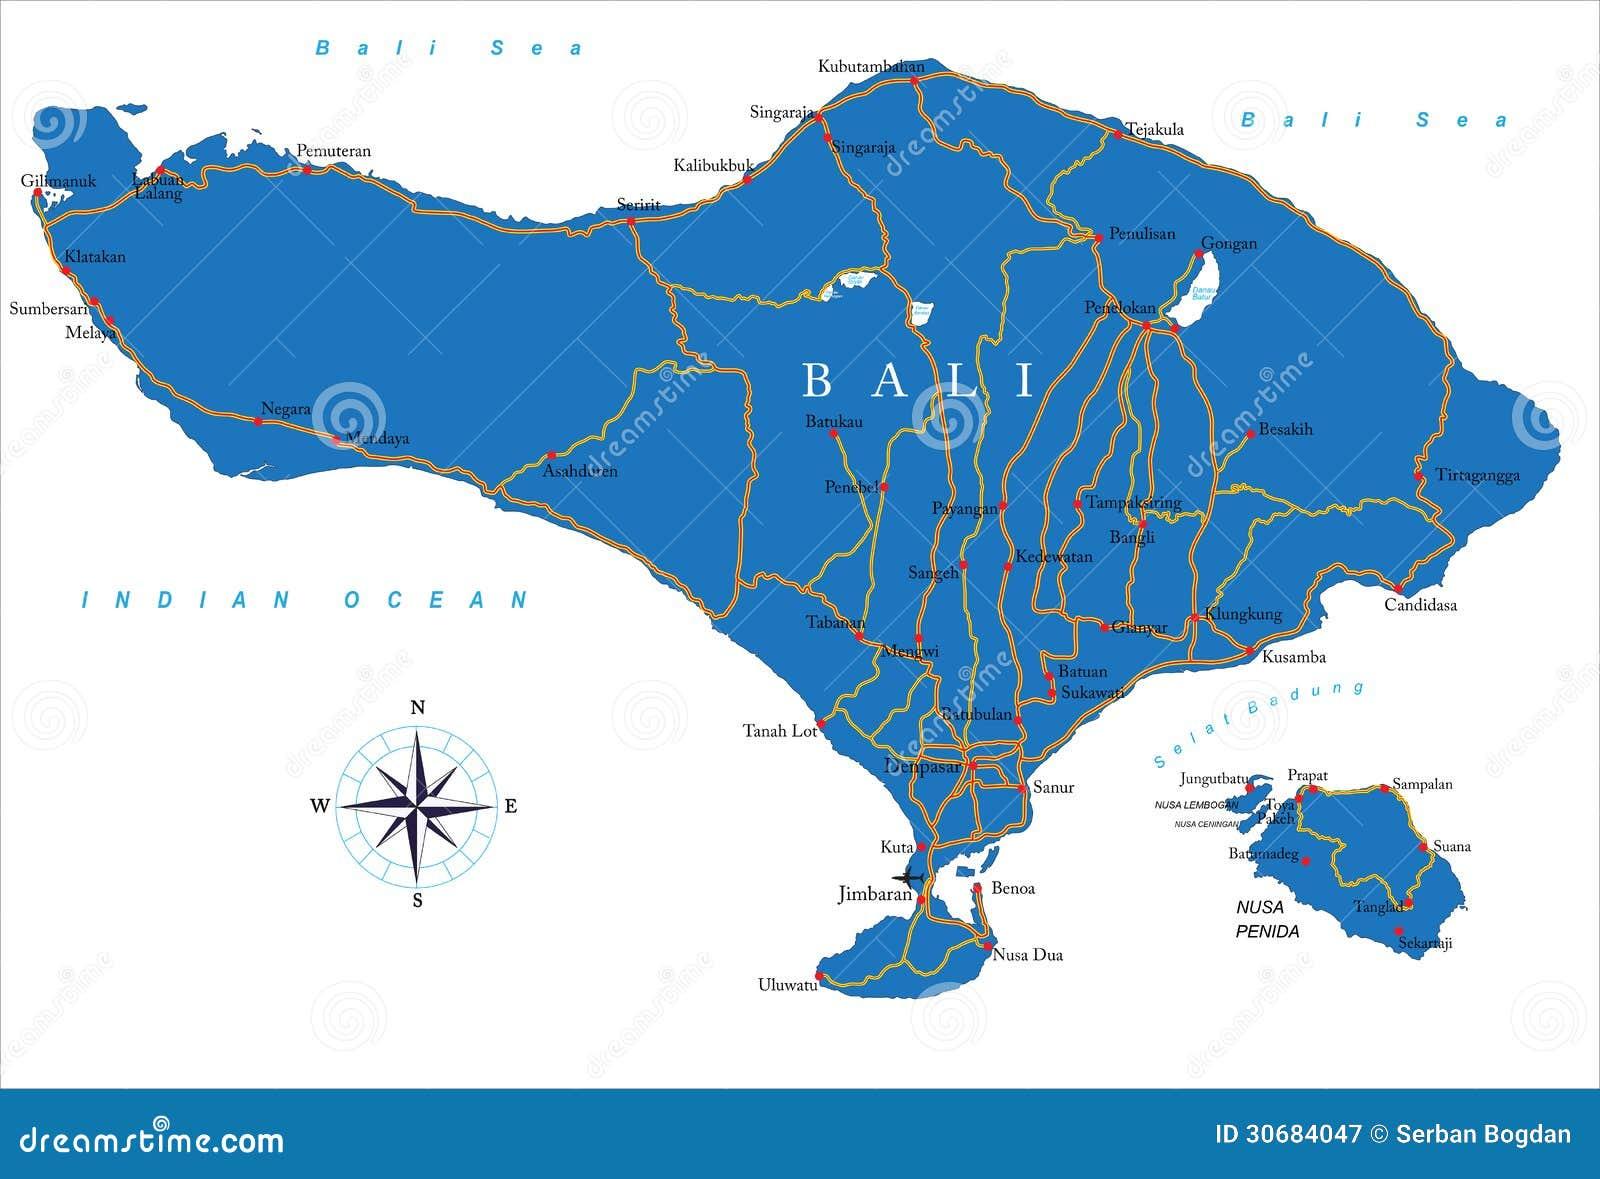 Carte Bali Candidasa.Carte De Bali Illustration De Vecteur Illustration Du